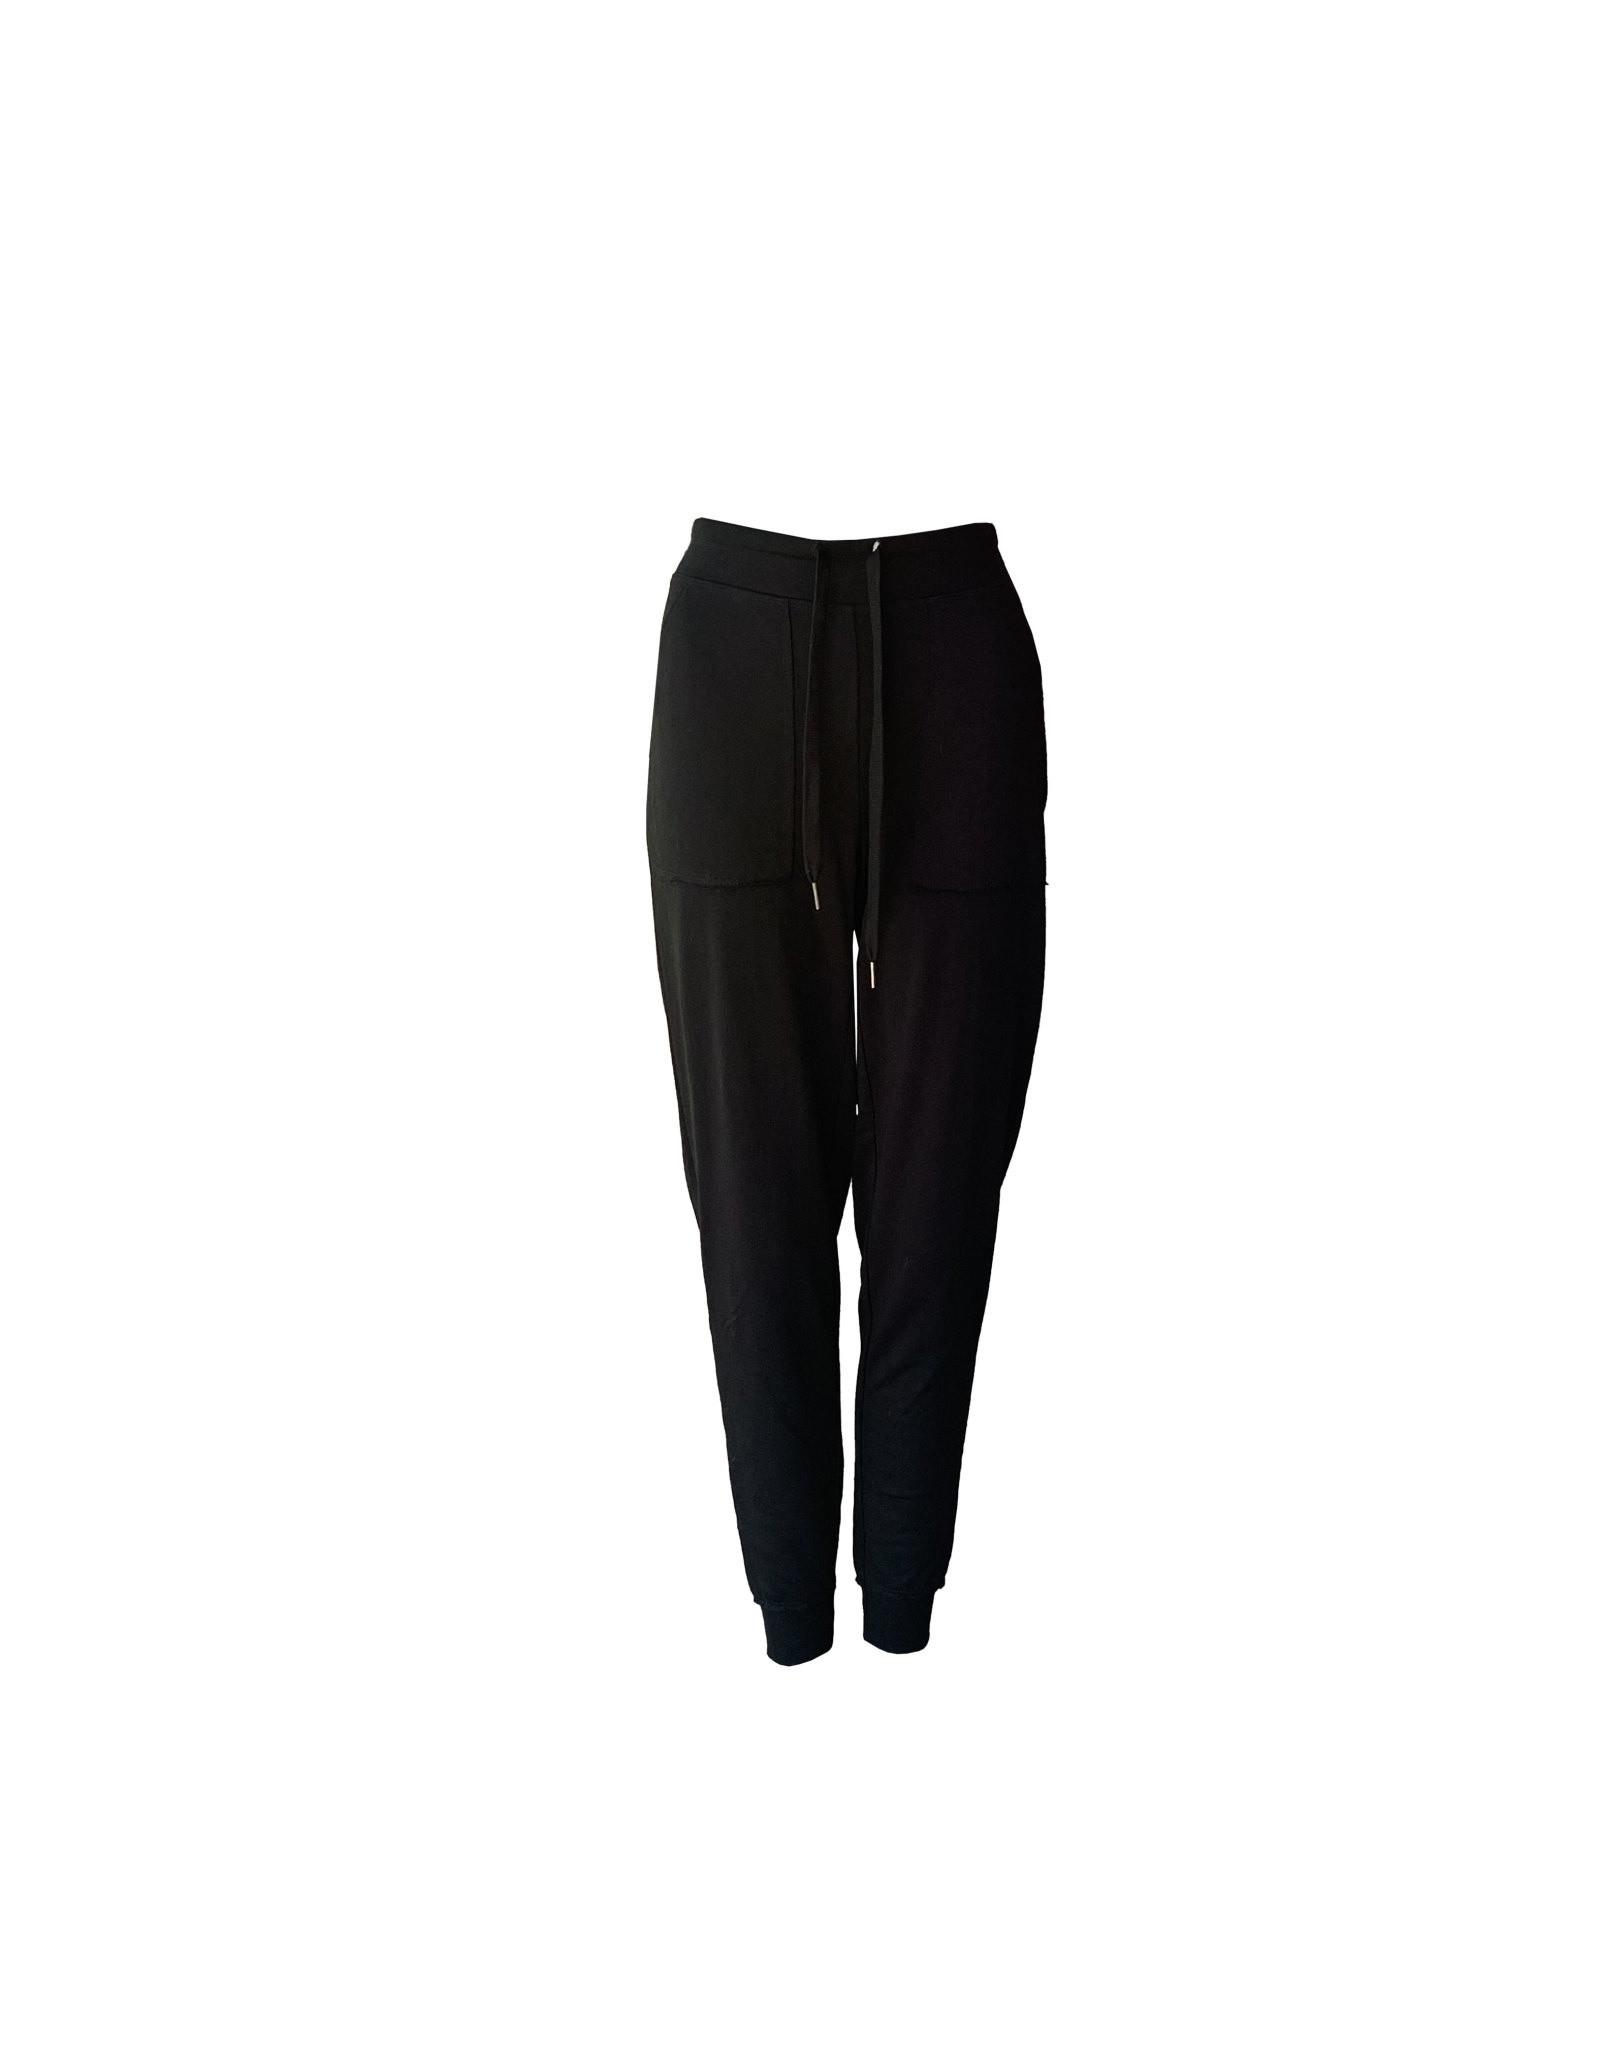 MARC NEW YORK Marc New York  Women's  Joggers  Pants Size S